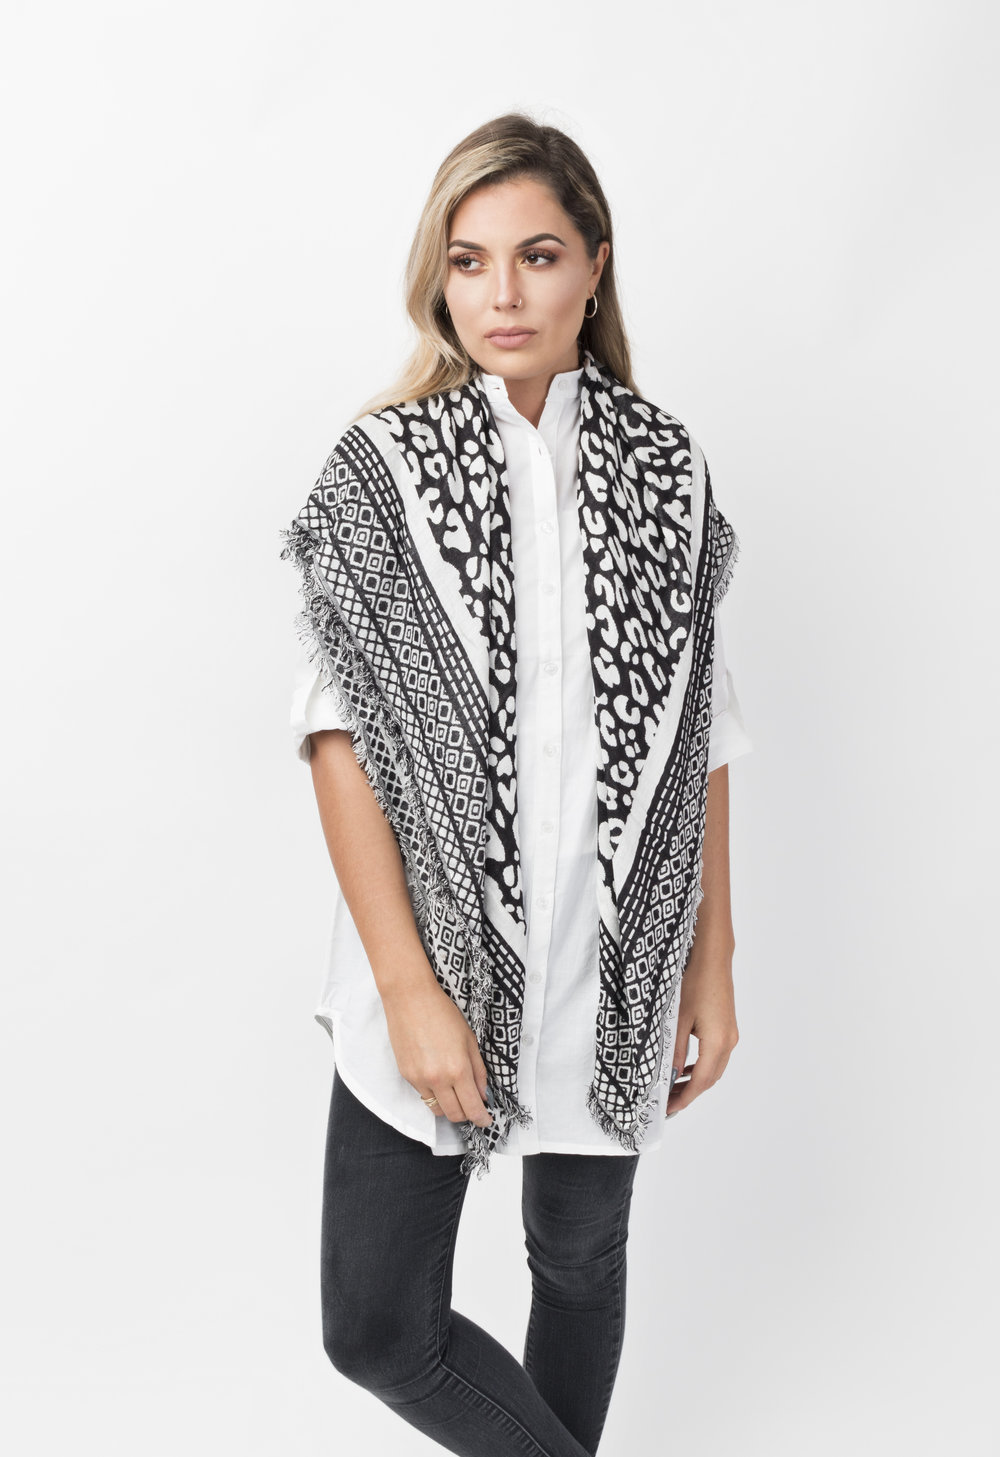 Melika scarf2.JPG